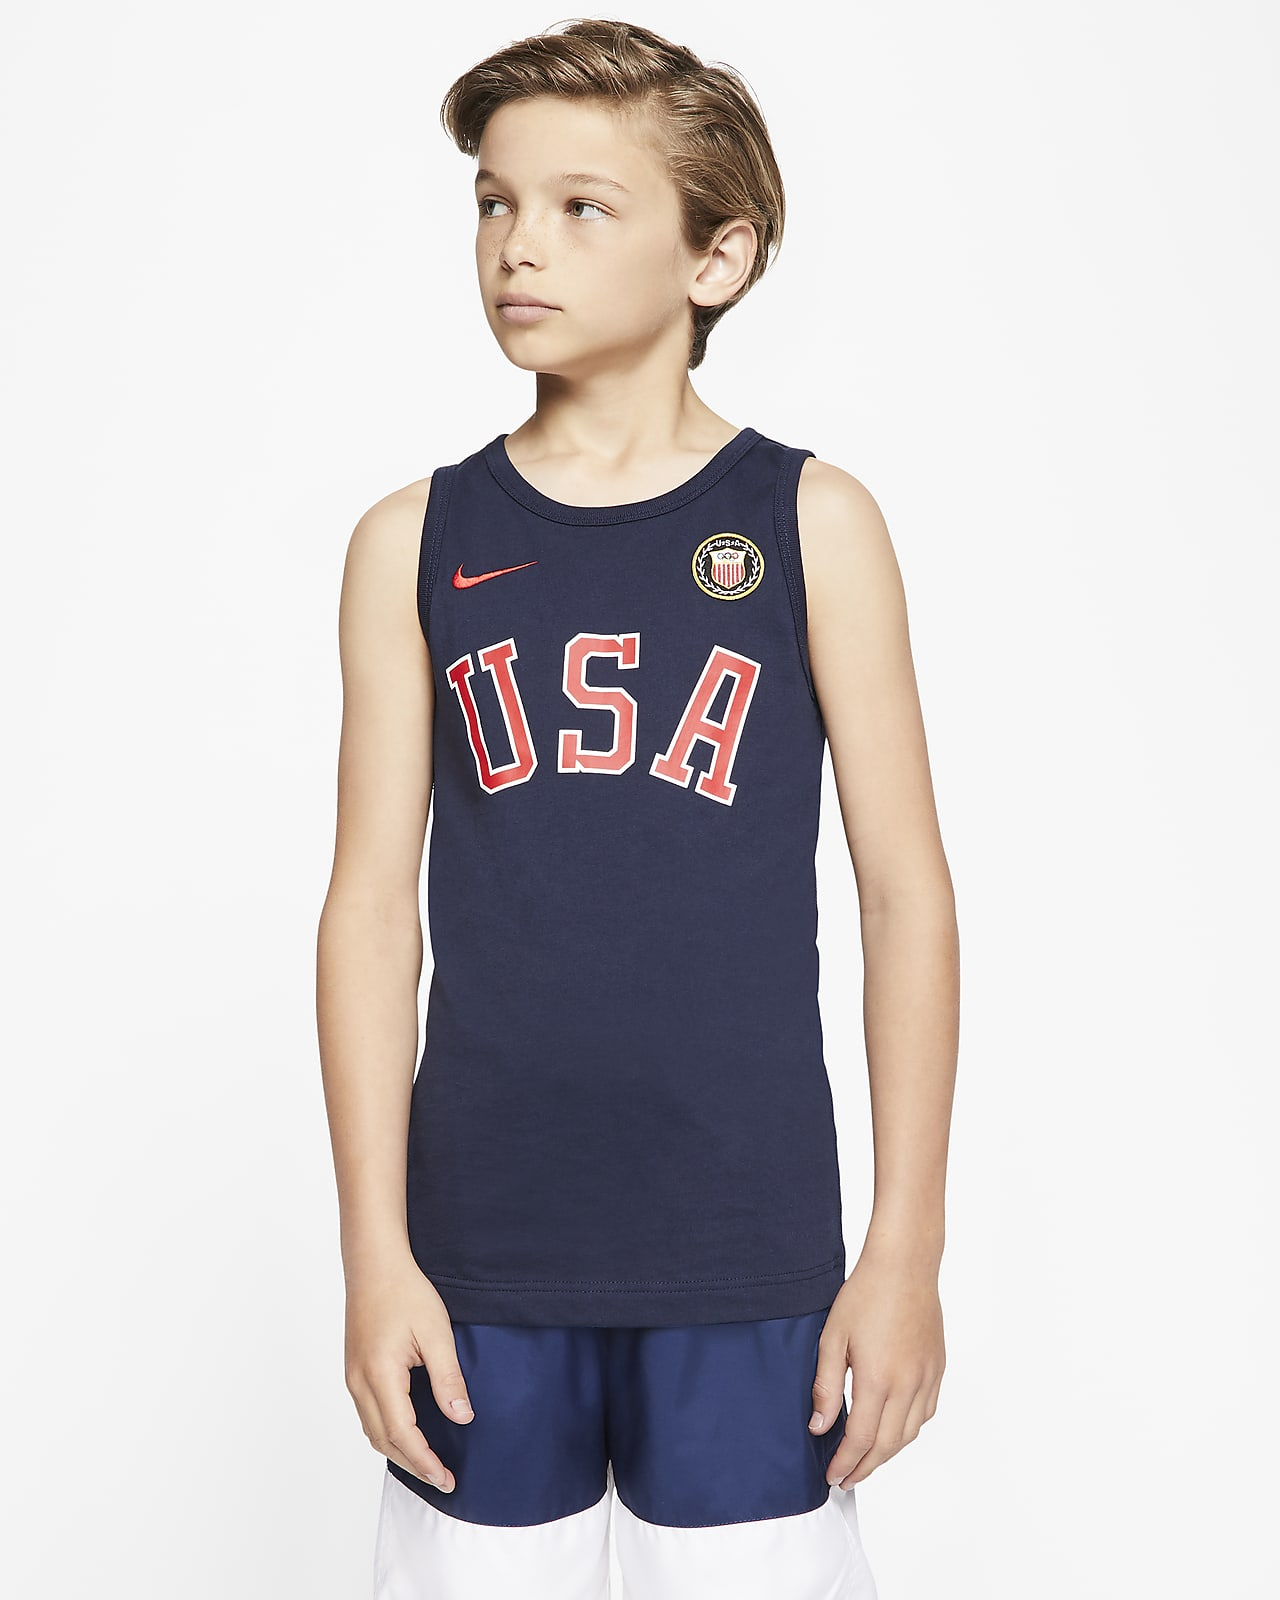 Camiseta de tirantes para niño talla grande Nike Sportswear Team USA